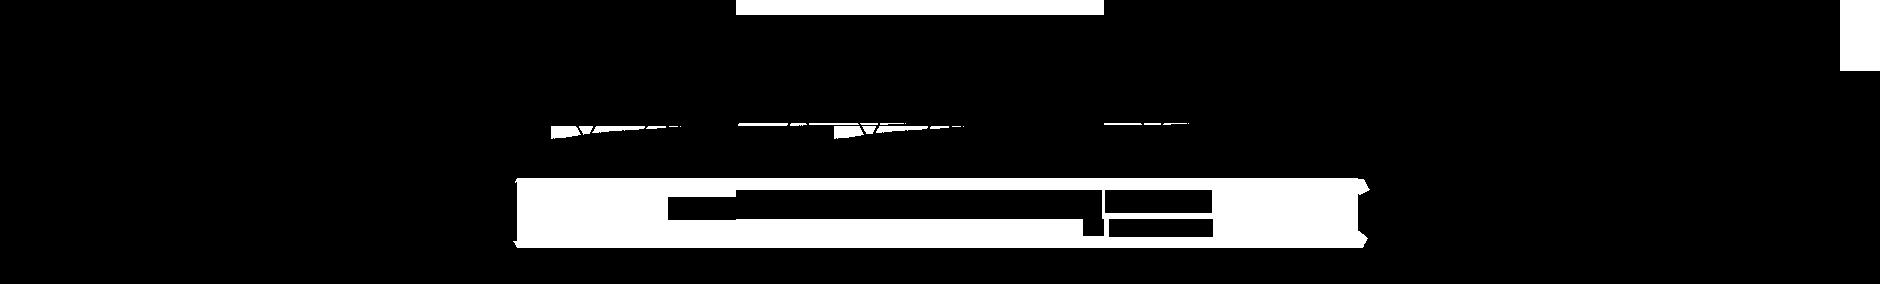 PranaLife Crystal Footer